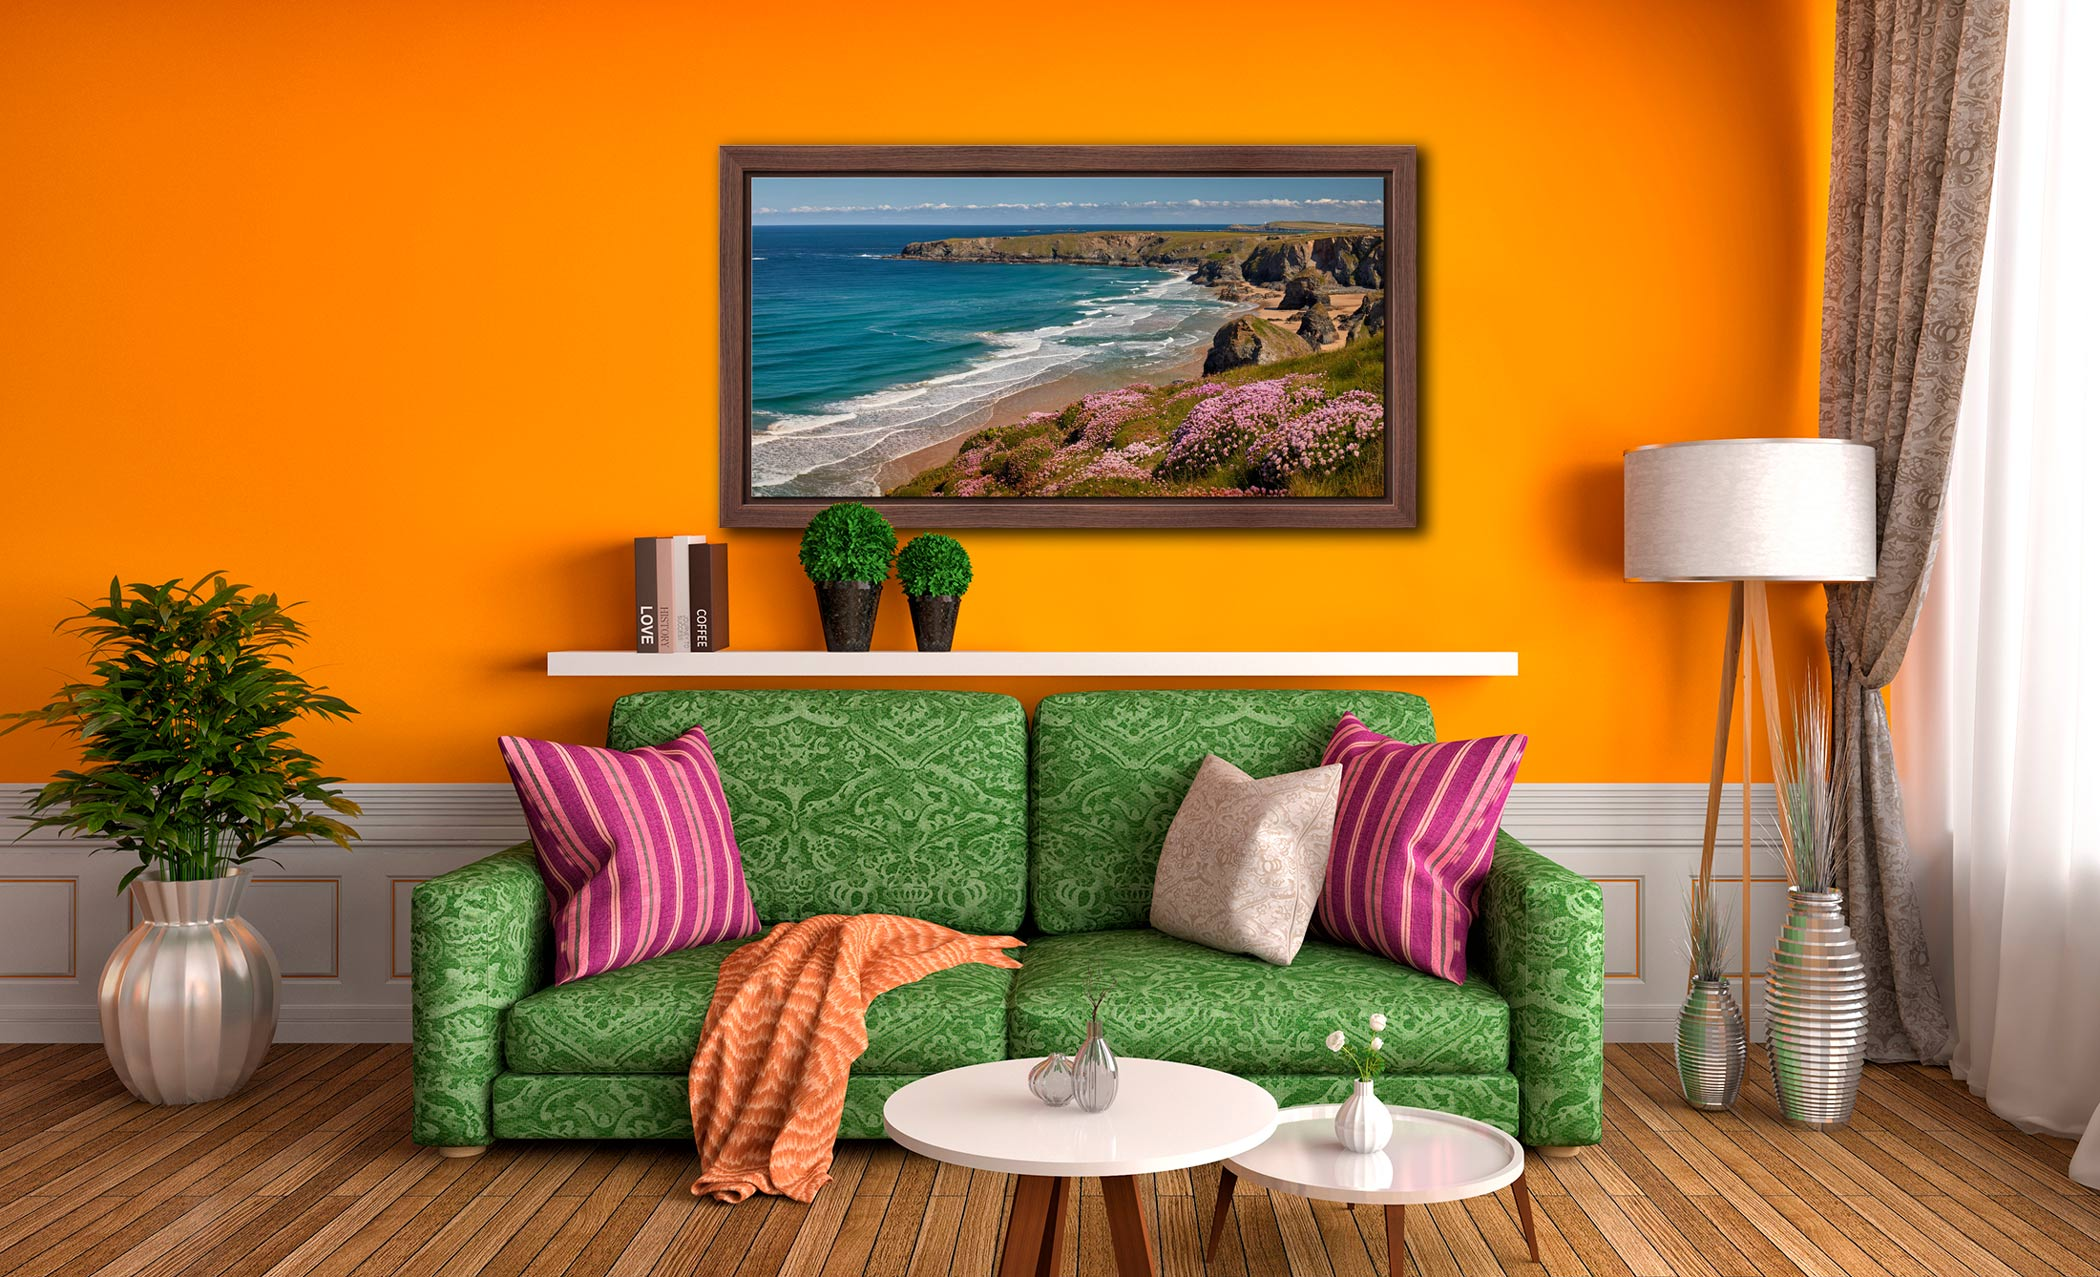 Spring Wildflowers Bedruthan Steps - Walnut floater frame with acrylic glazing on Wall